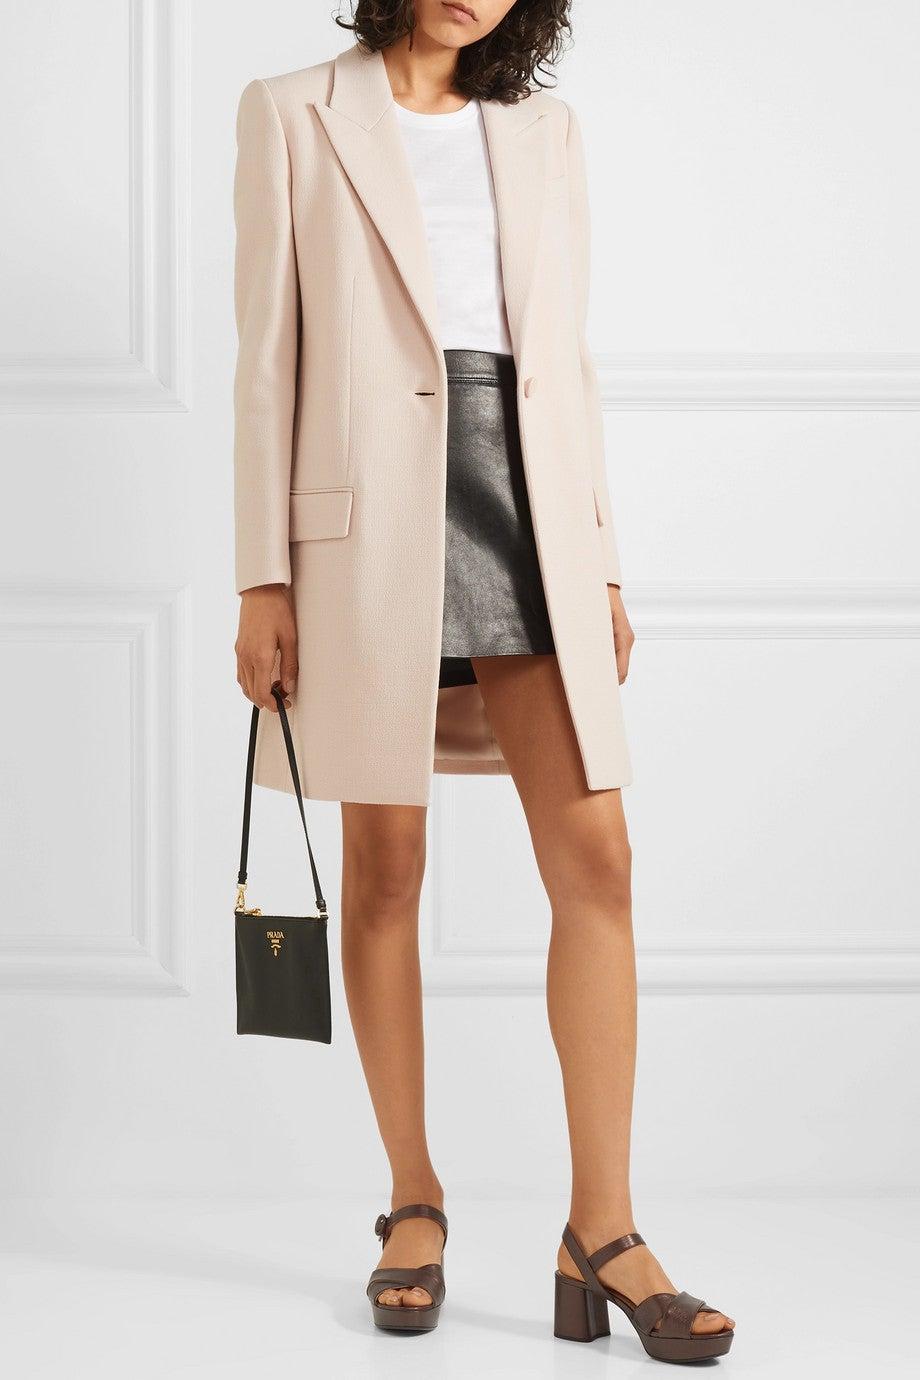 adidas By Stella McCartney Blue Runway Fleece Activewear Outerwear Size 6 (S, 28) 78% off retail